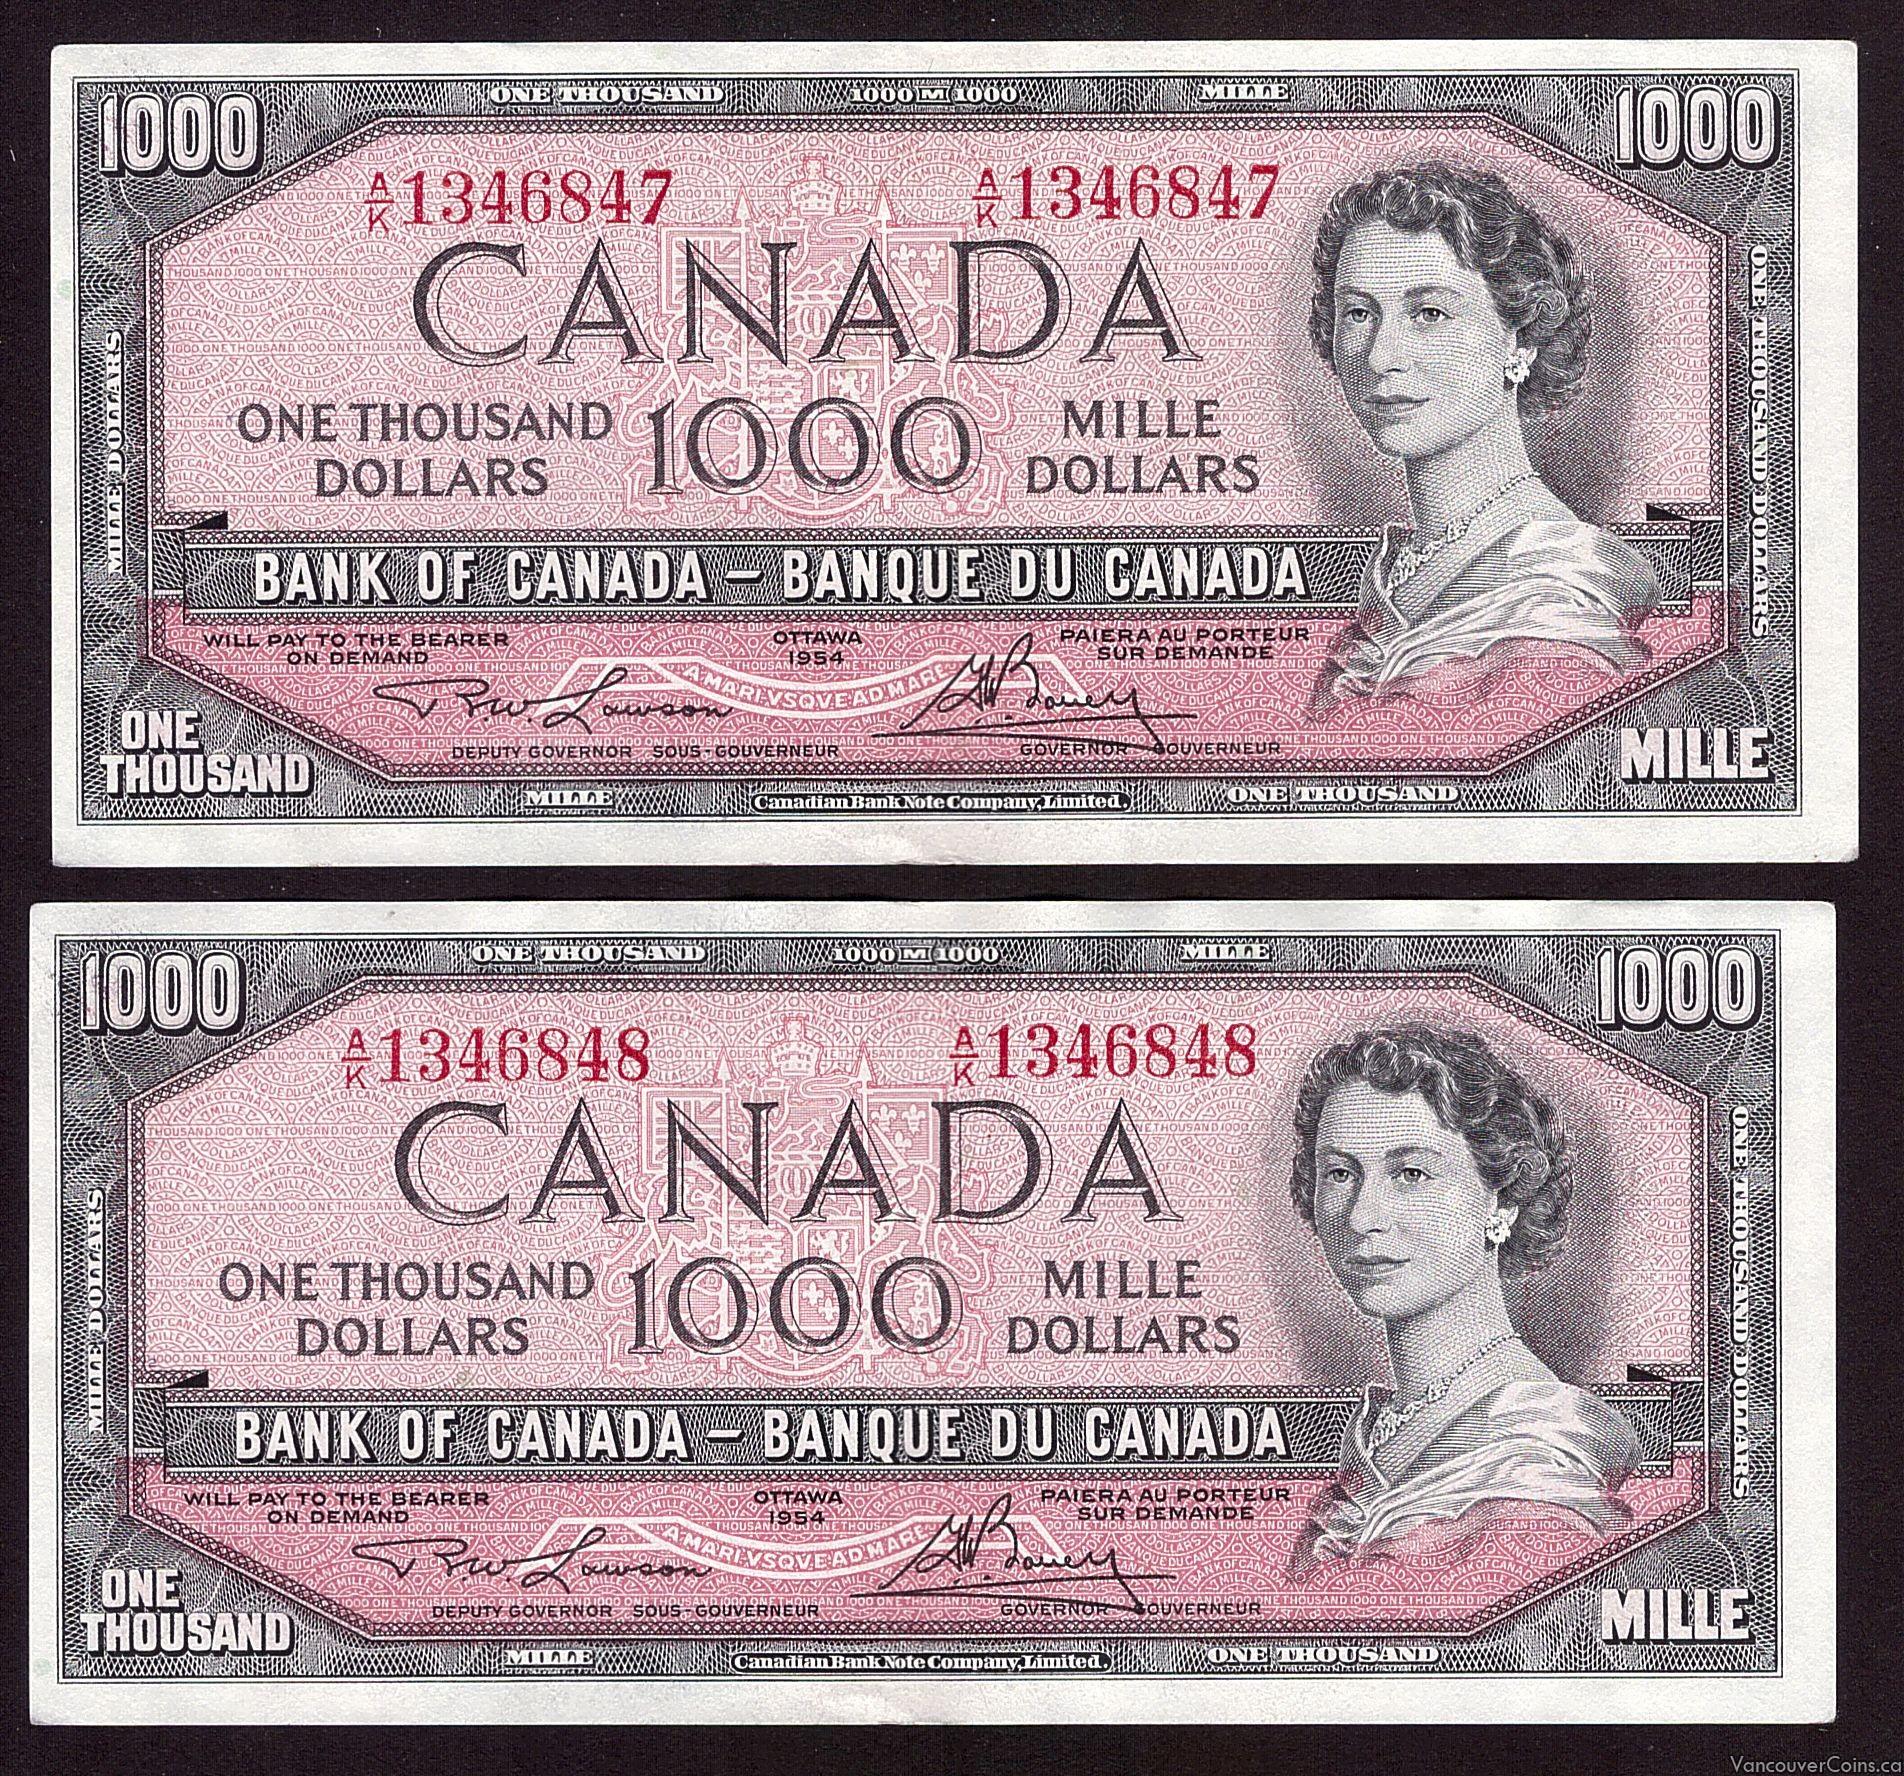 2x 1954 Canada $1000 banknotes AU50 EPQ